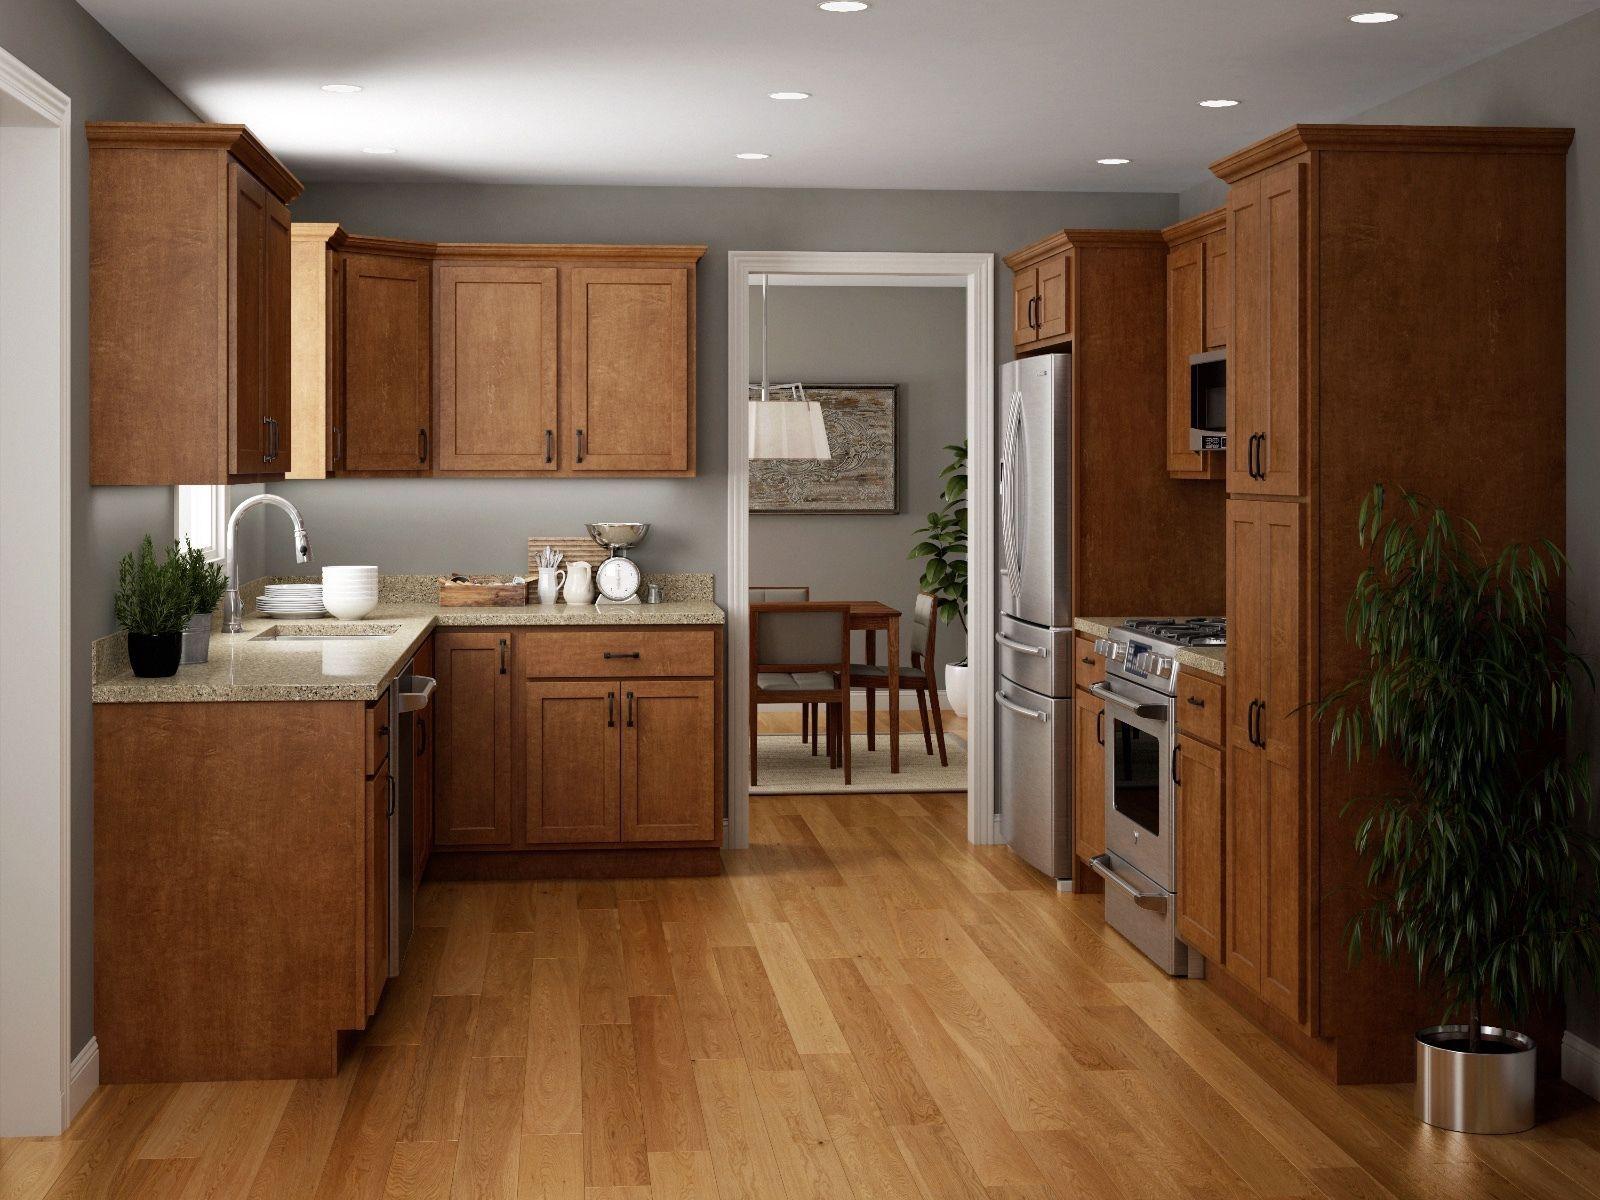 Salem Brown Collection JSI 10x10 kitchen cabinets Kitchen